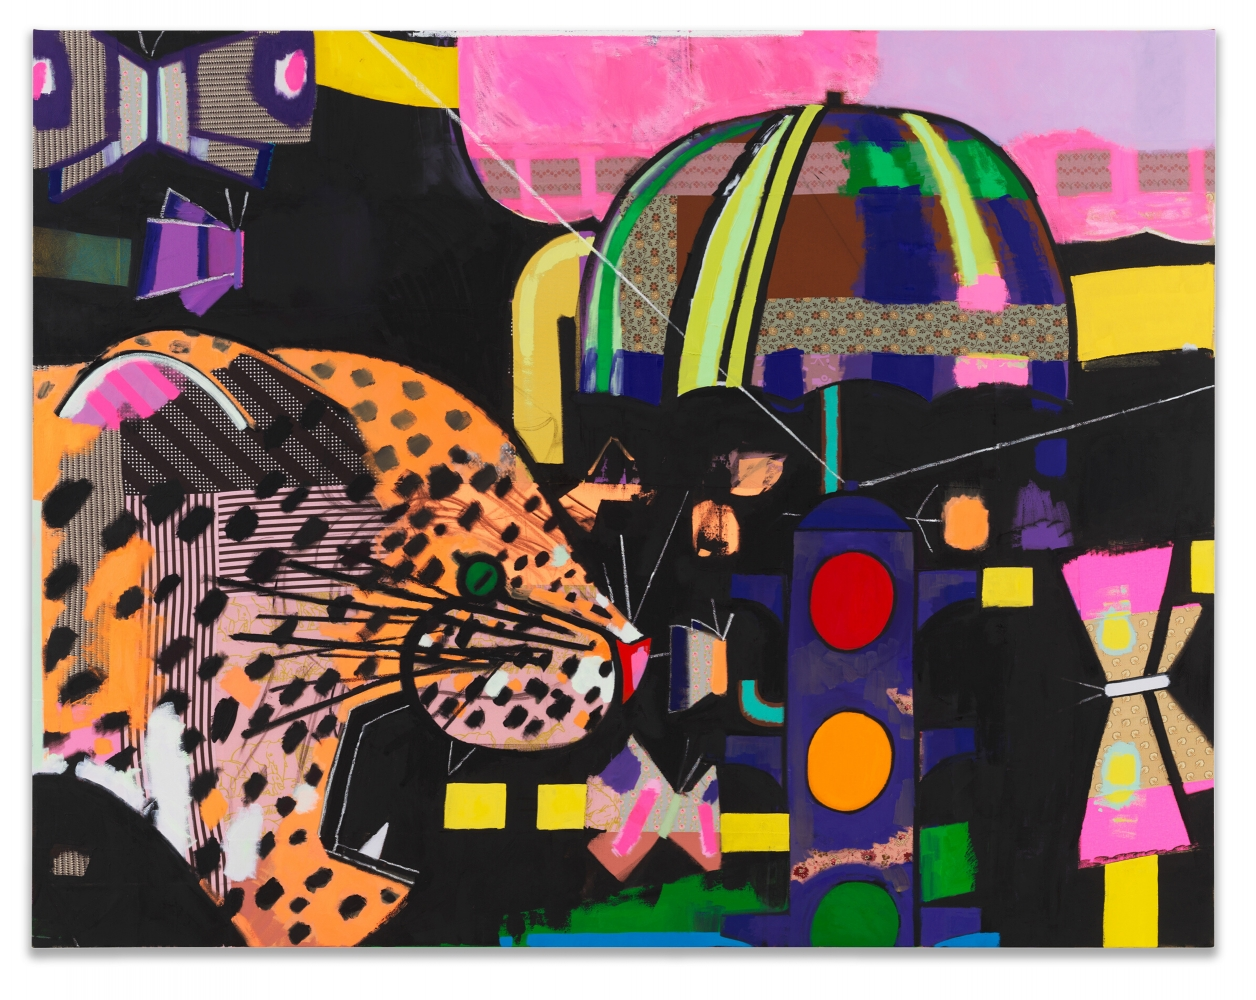 Ellen Berkenblit, Calico Leopard, 2019